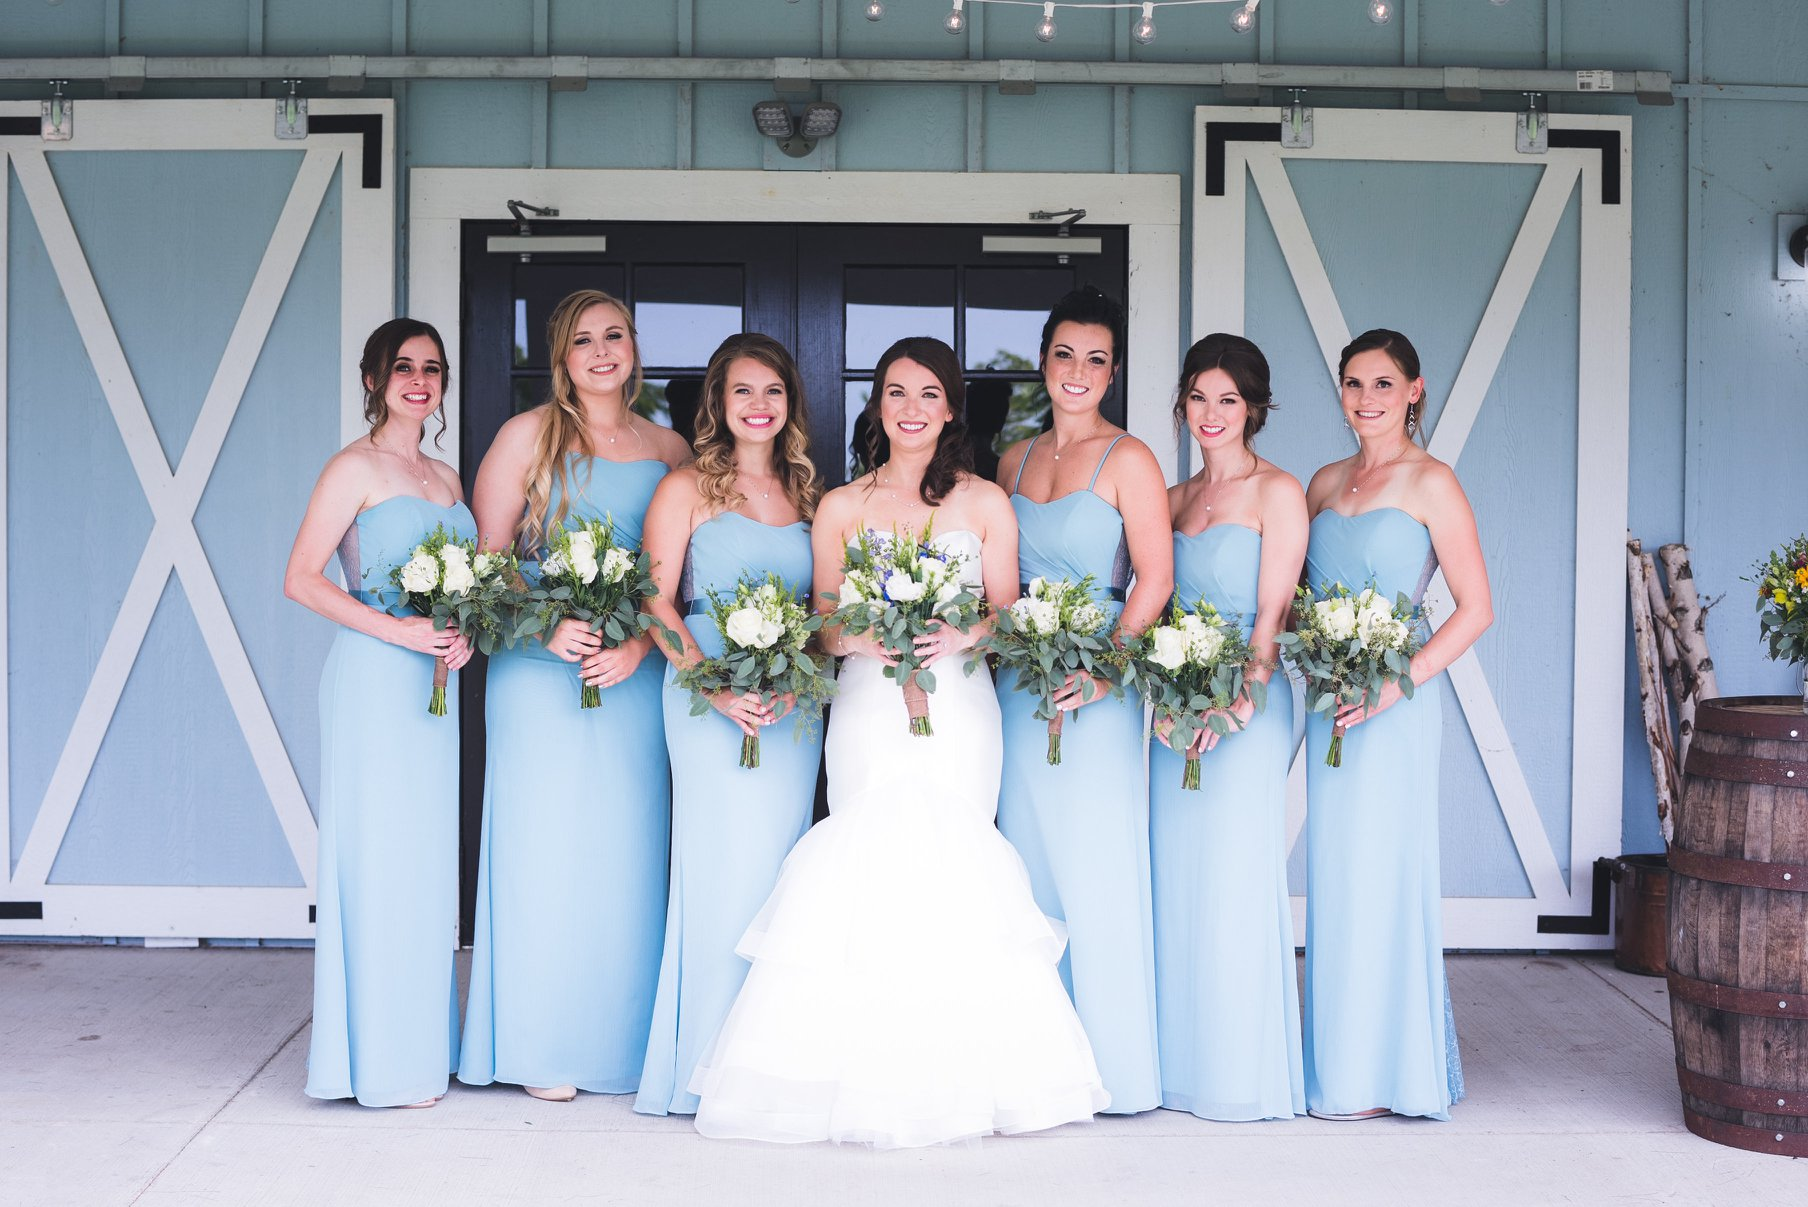 Glamorous Bride & Bridal Party